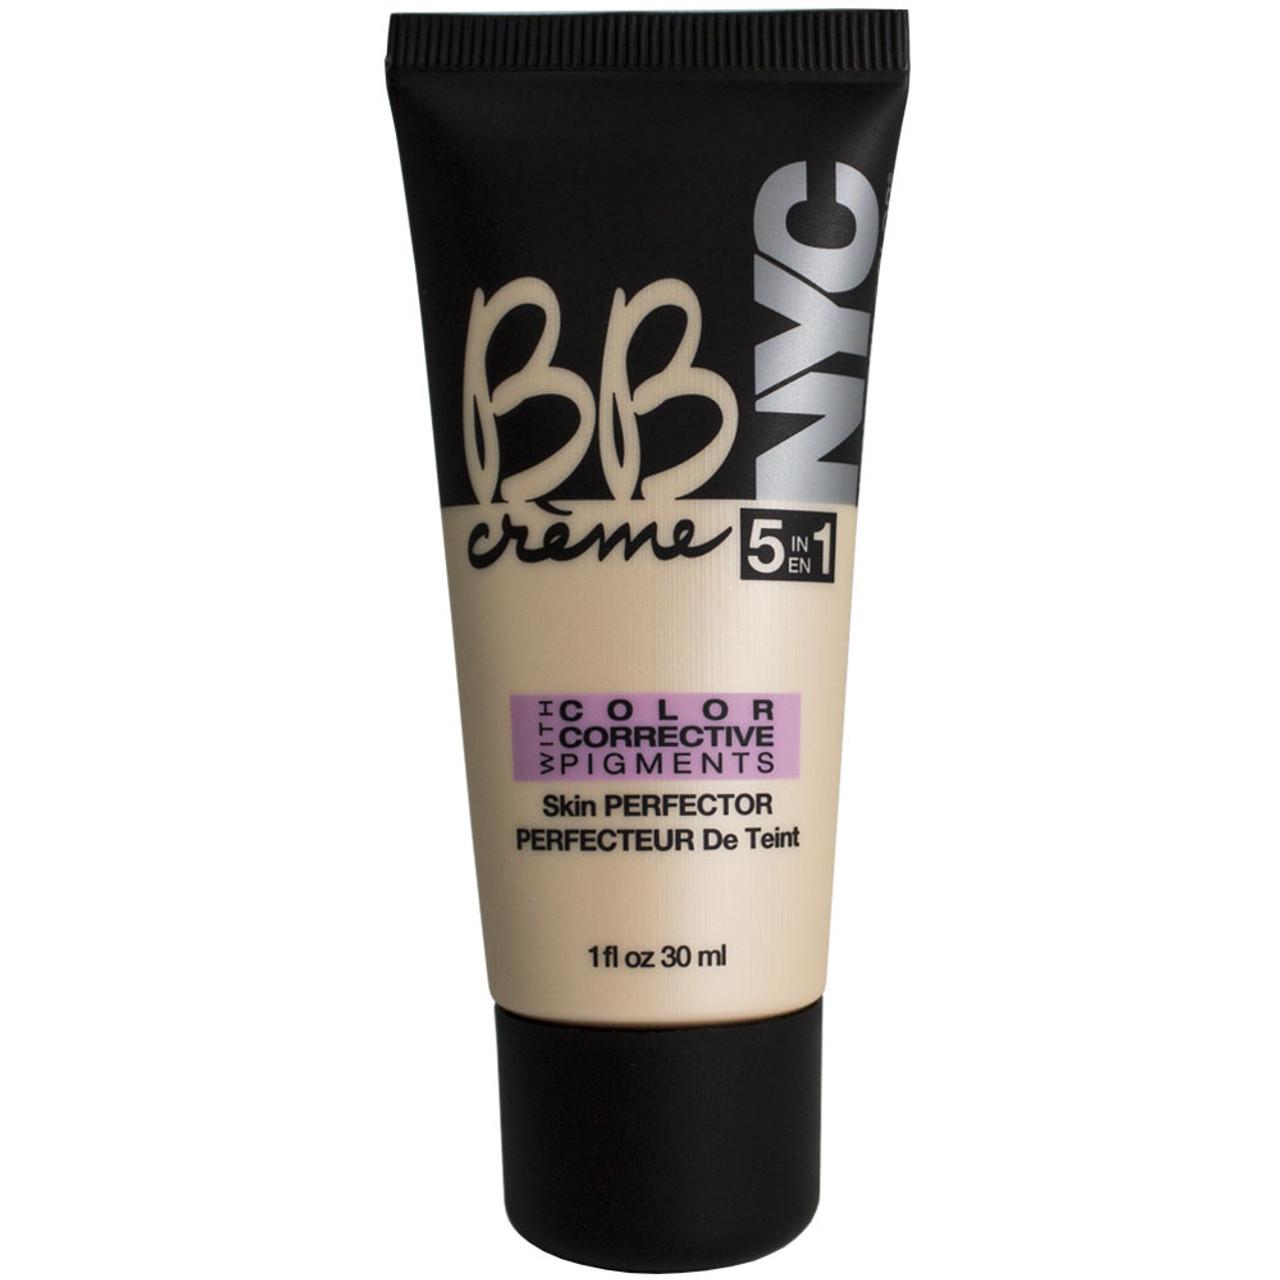 Nyc Bb Creme 5 In 1 Color Corrective Skin Perfector Buymebeautycom